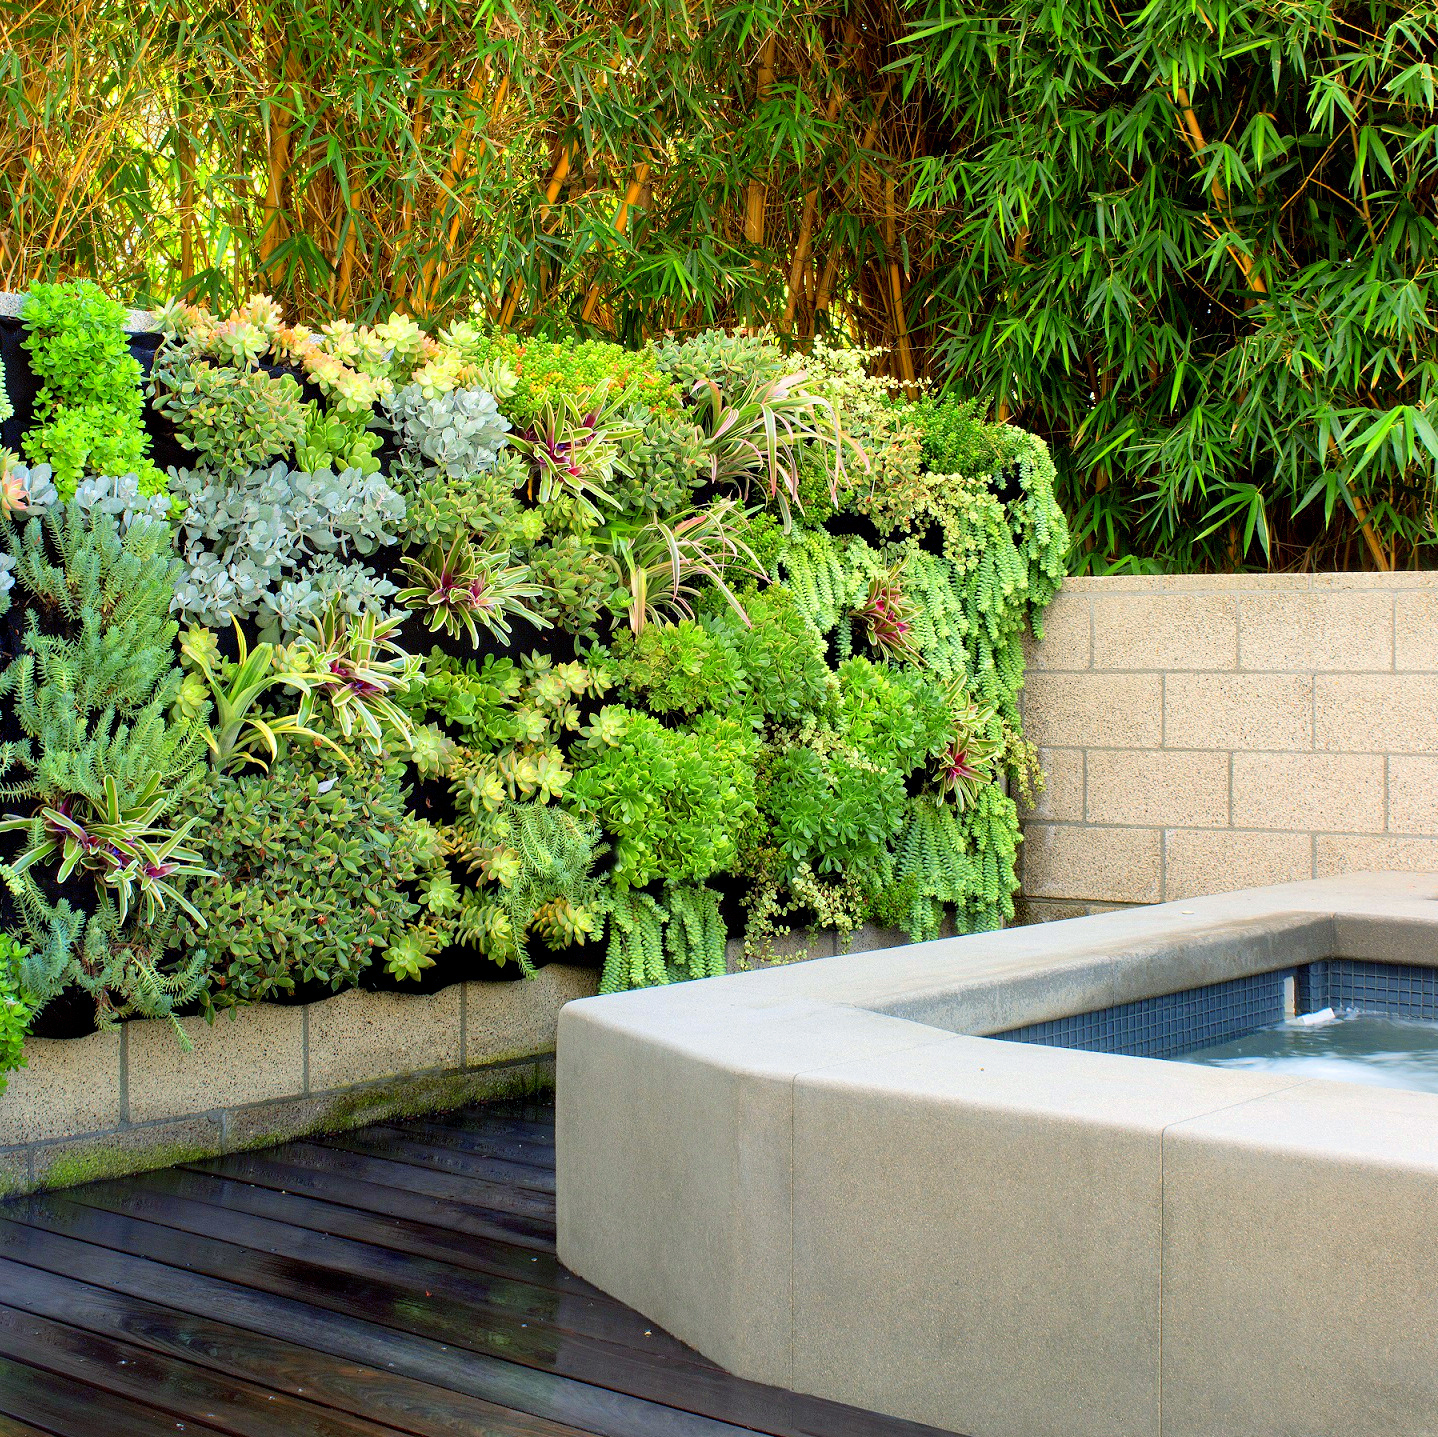 Kerry Bauer, Greenscaped Buildings San Diego. Florafelt System